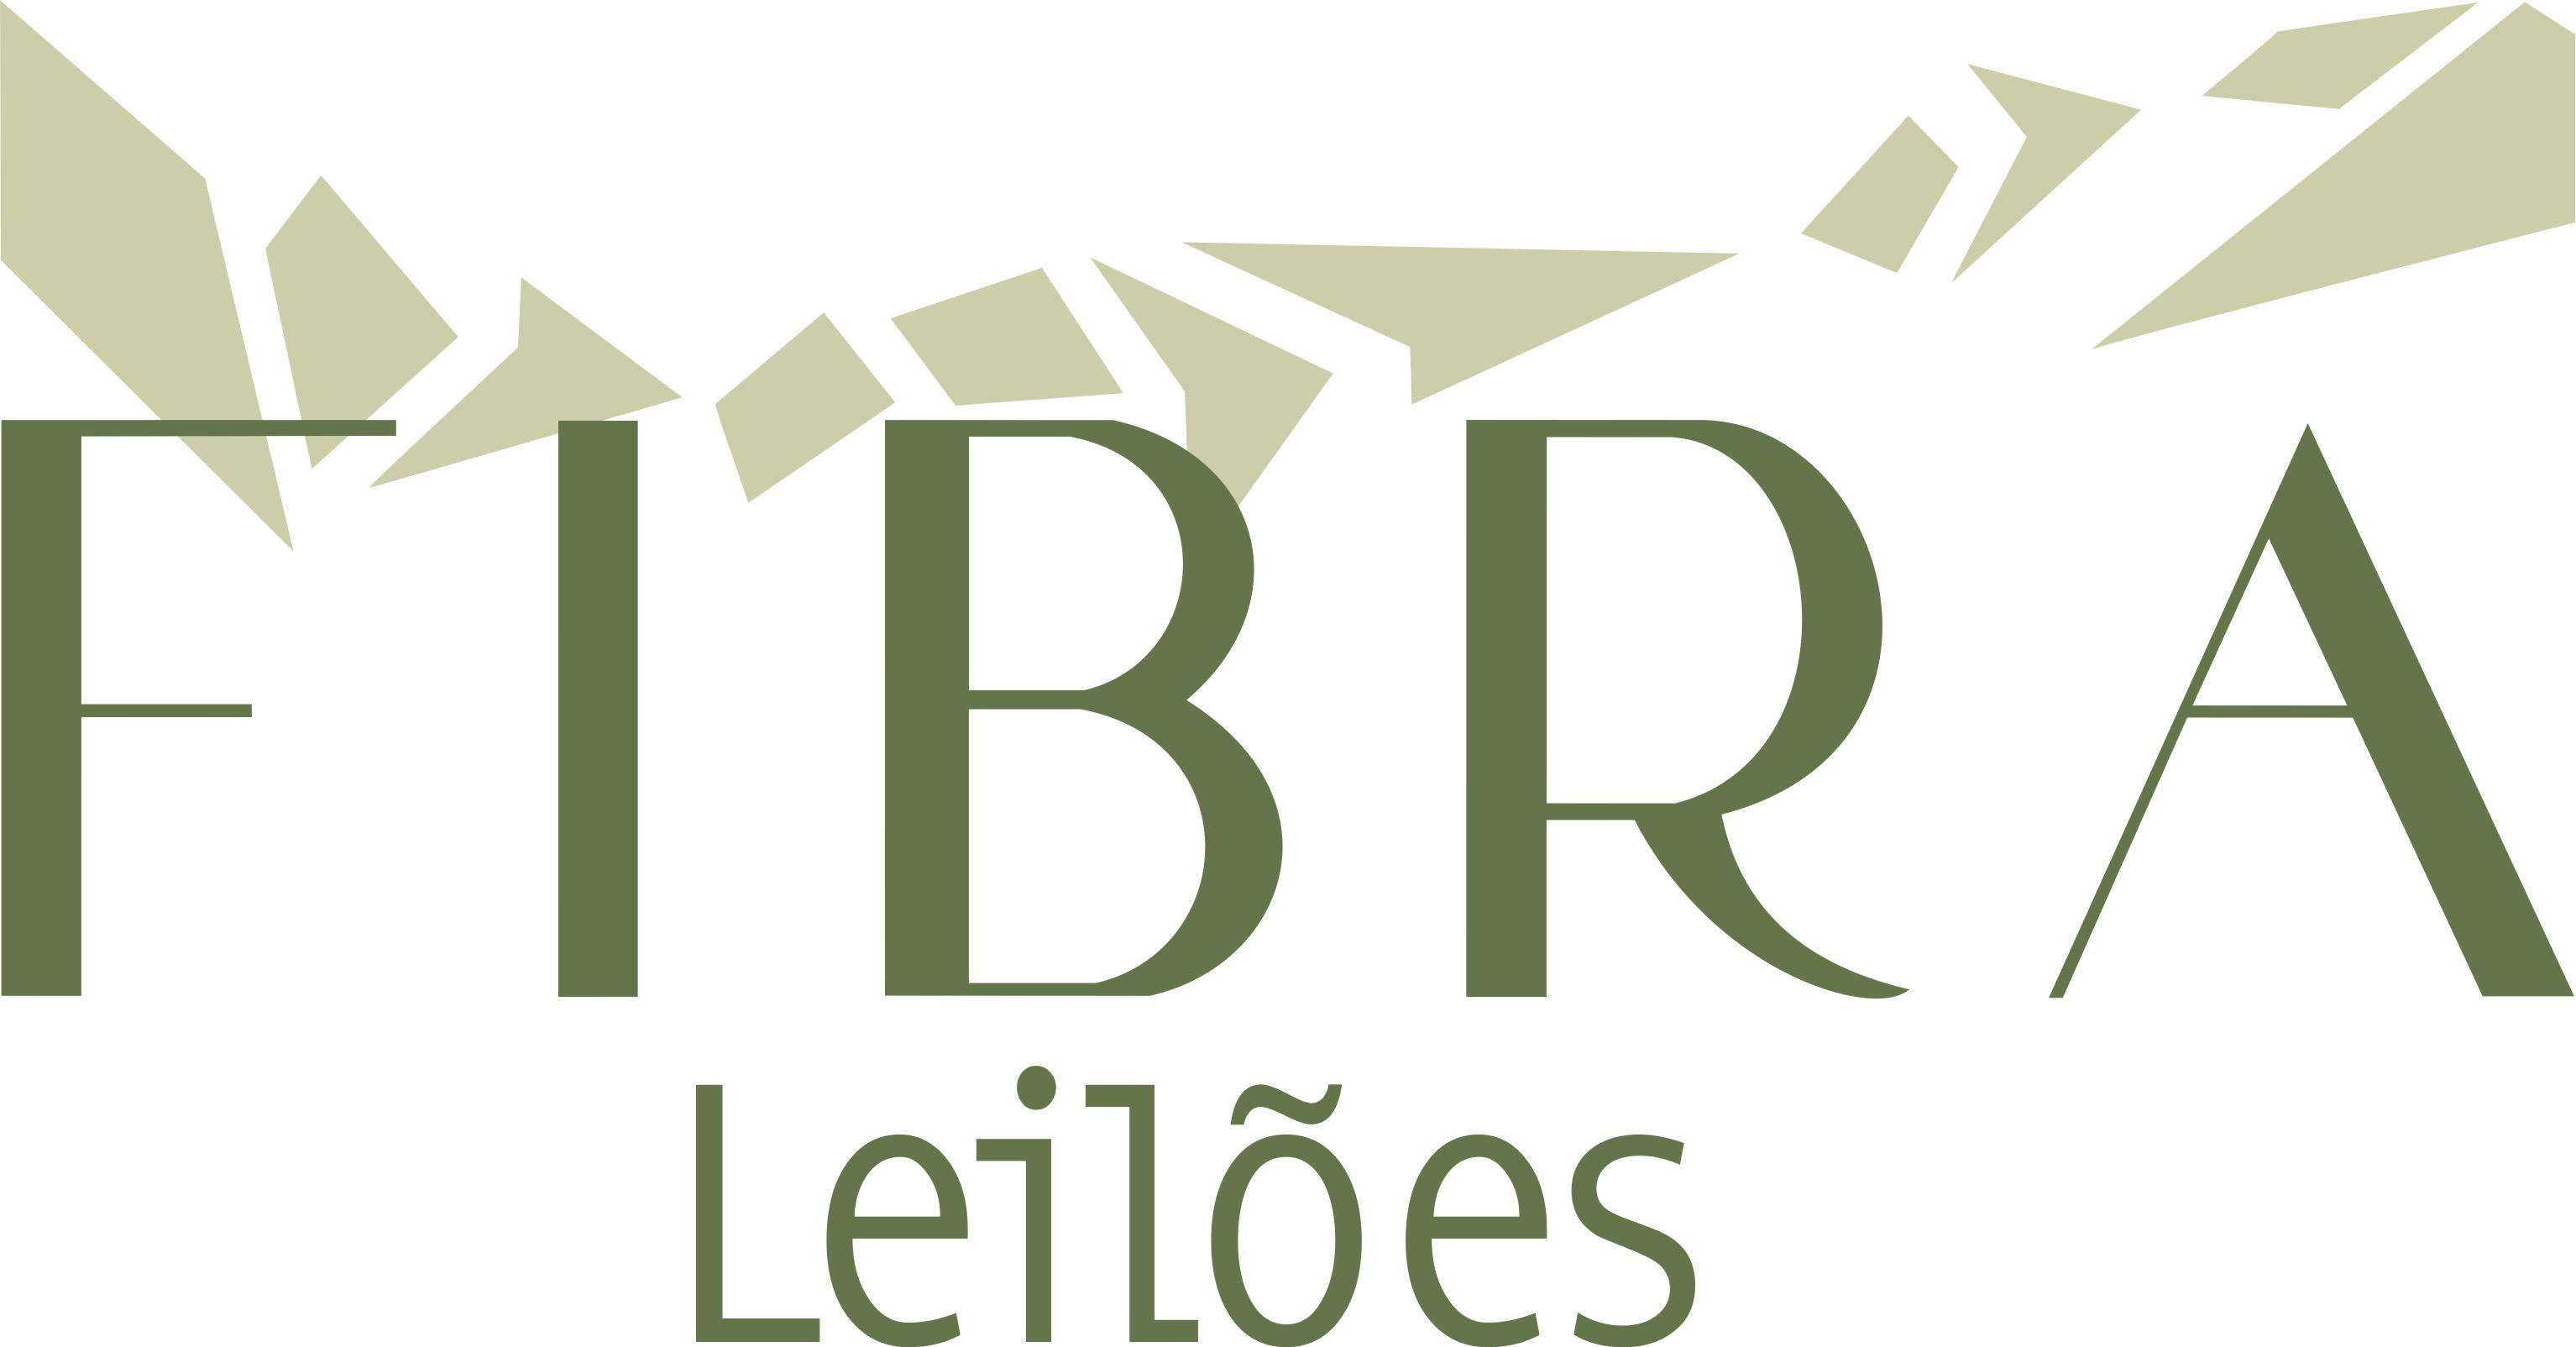 logomarca Fibra leiloes